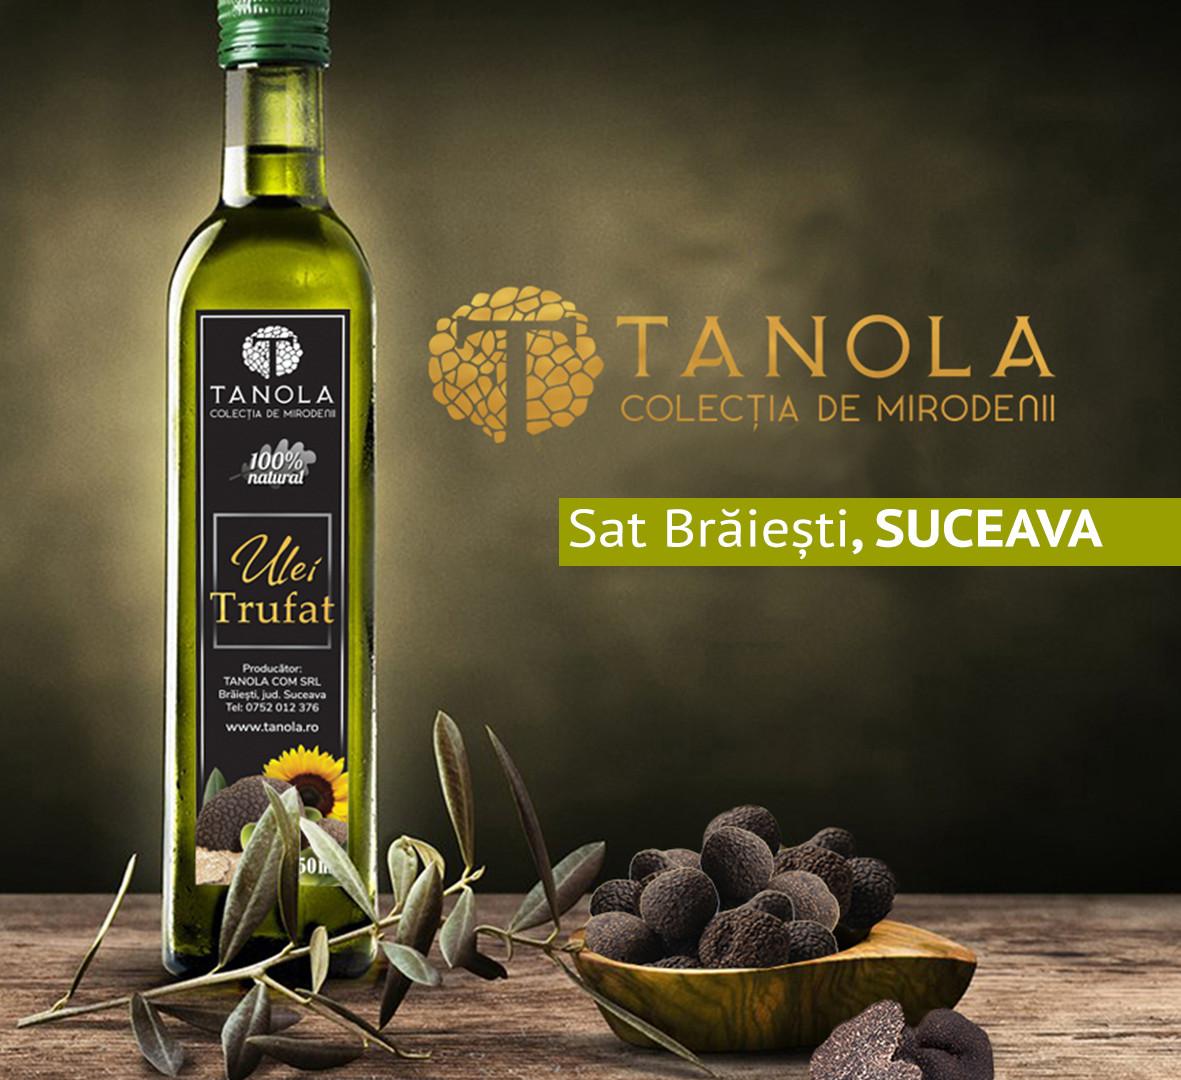 Tanola